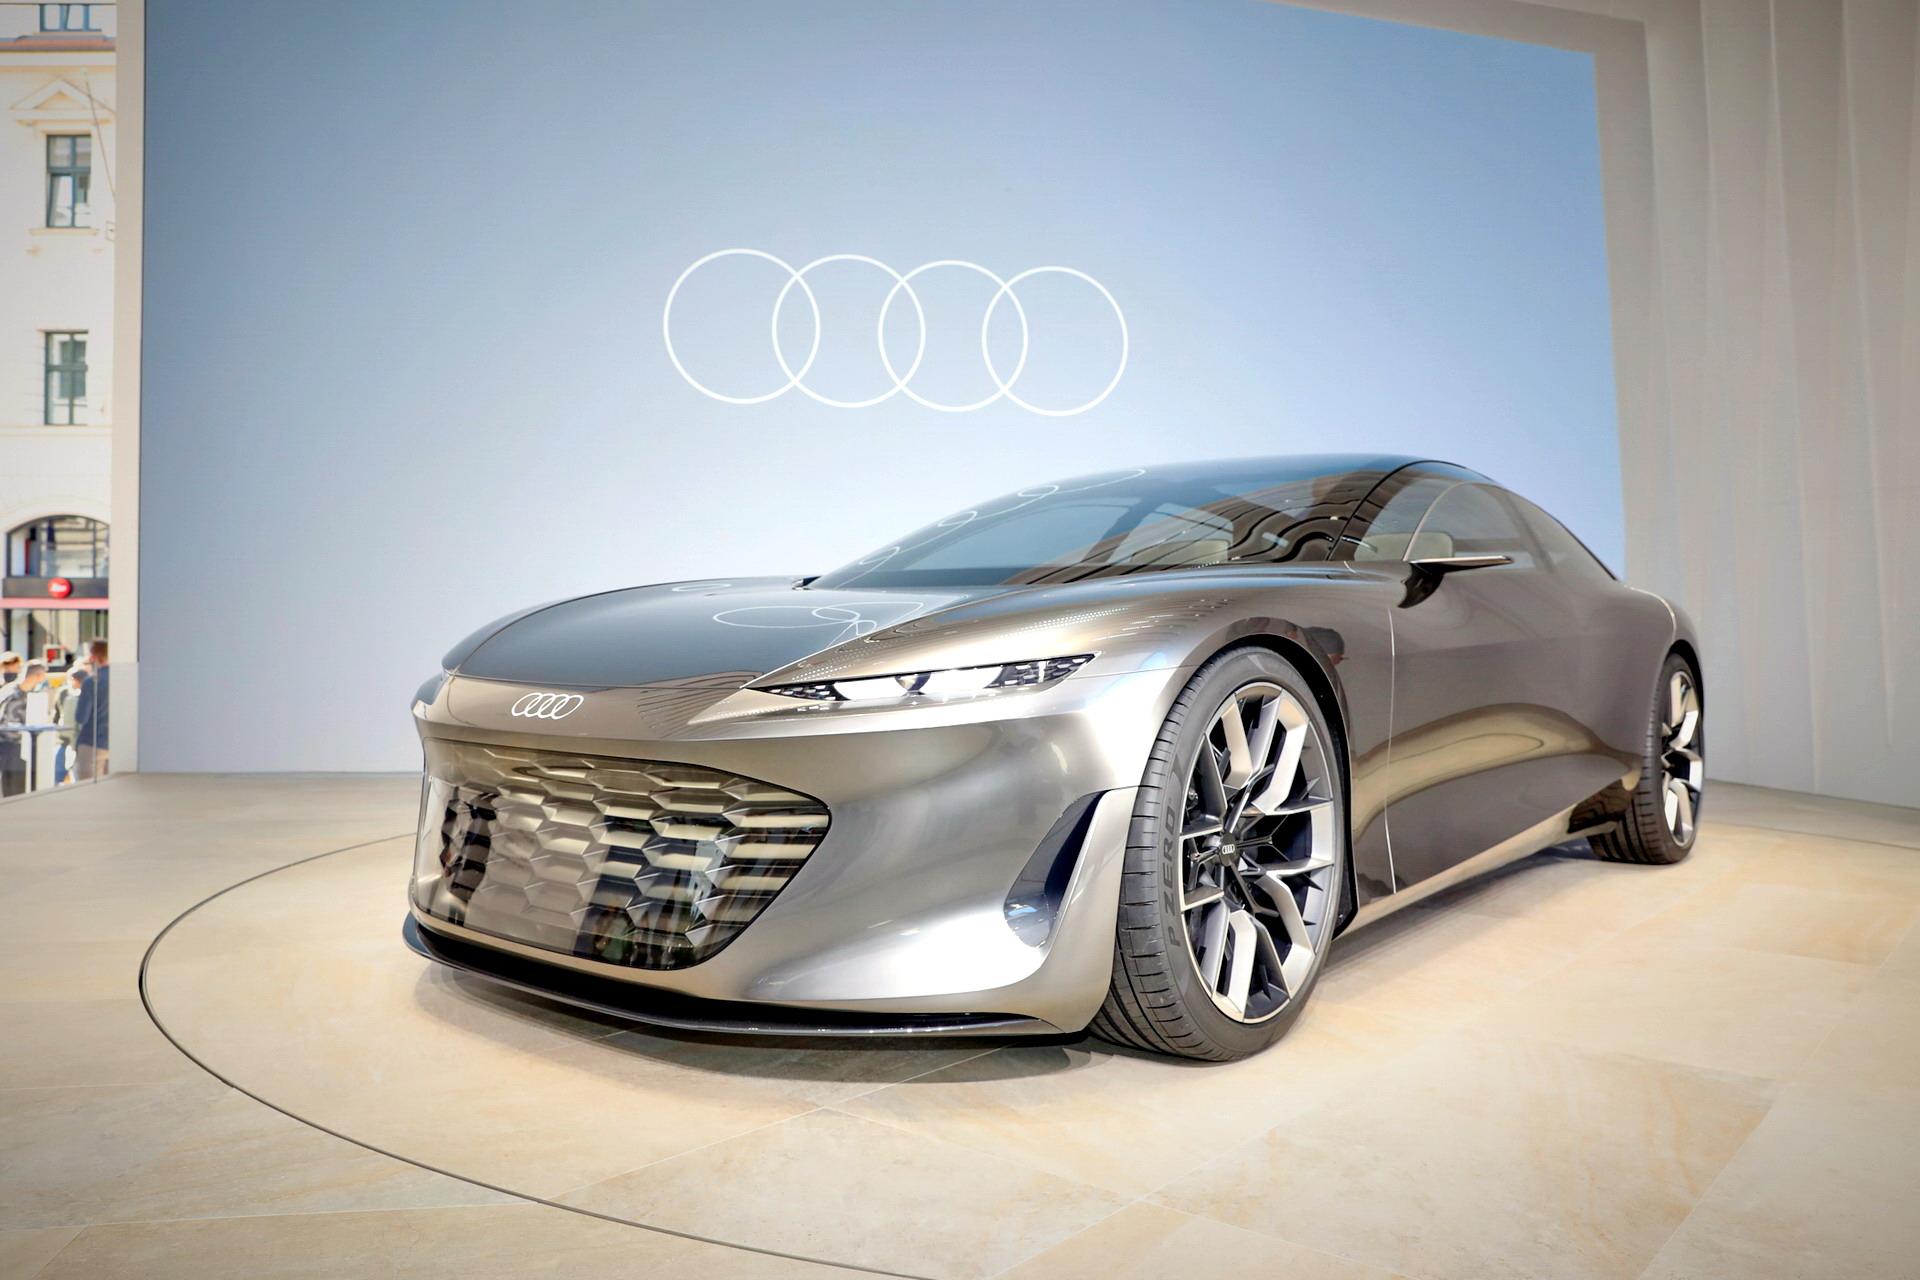 Audi-GrandSphere-Concept-A8-39.jpg